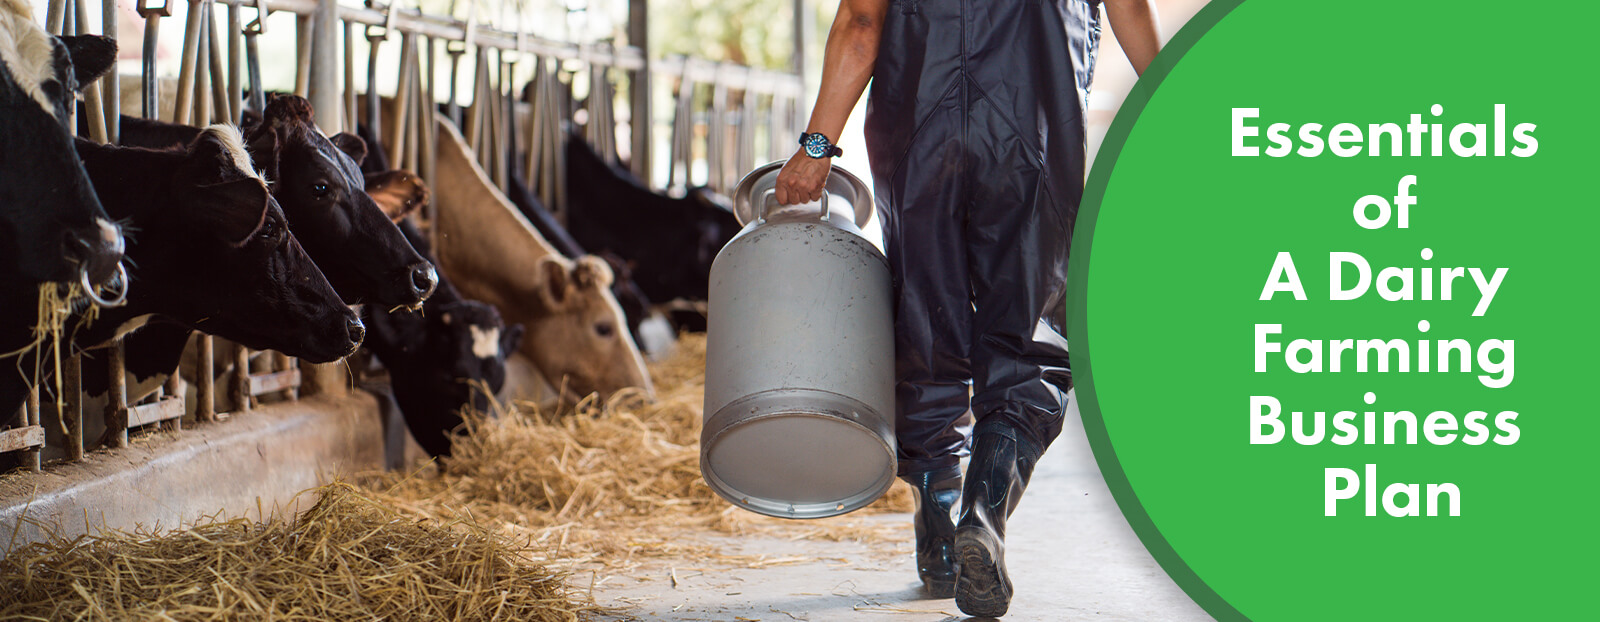 Essentials of A Dairy Farming Business Plan